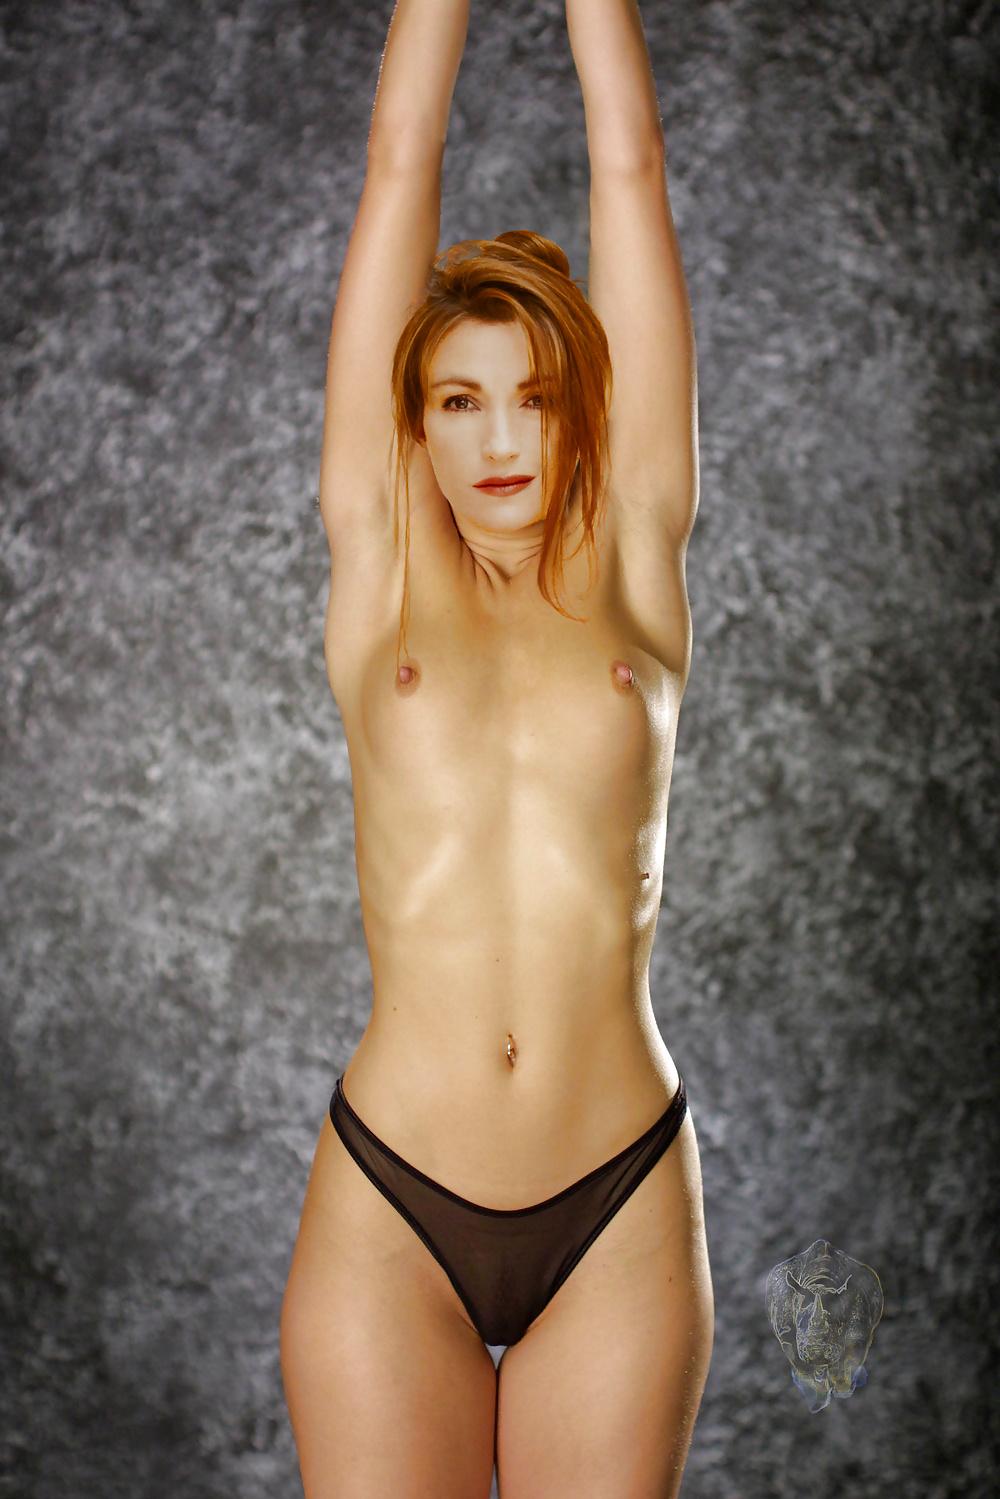 Jane seymour fake nude porn